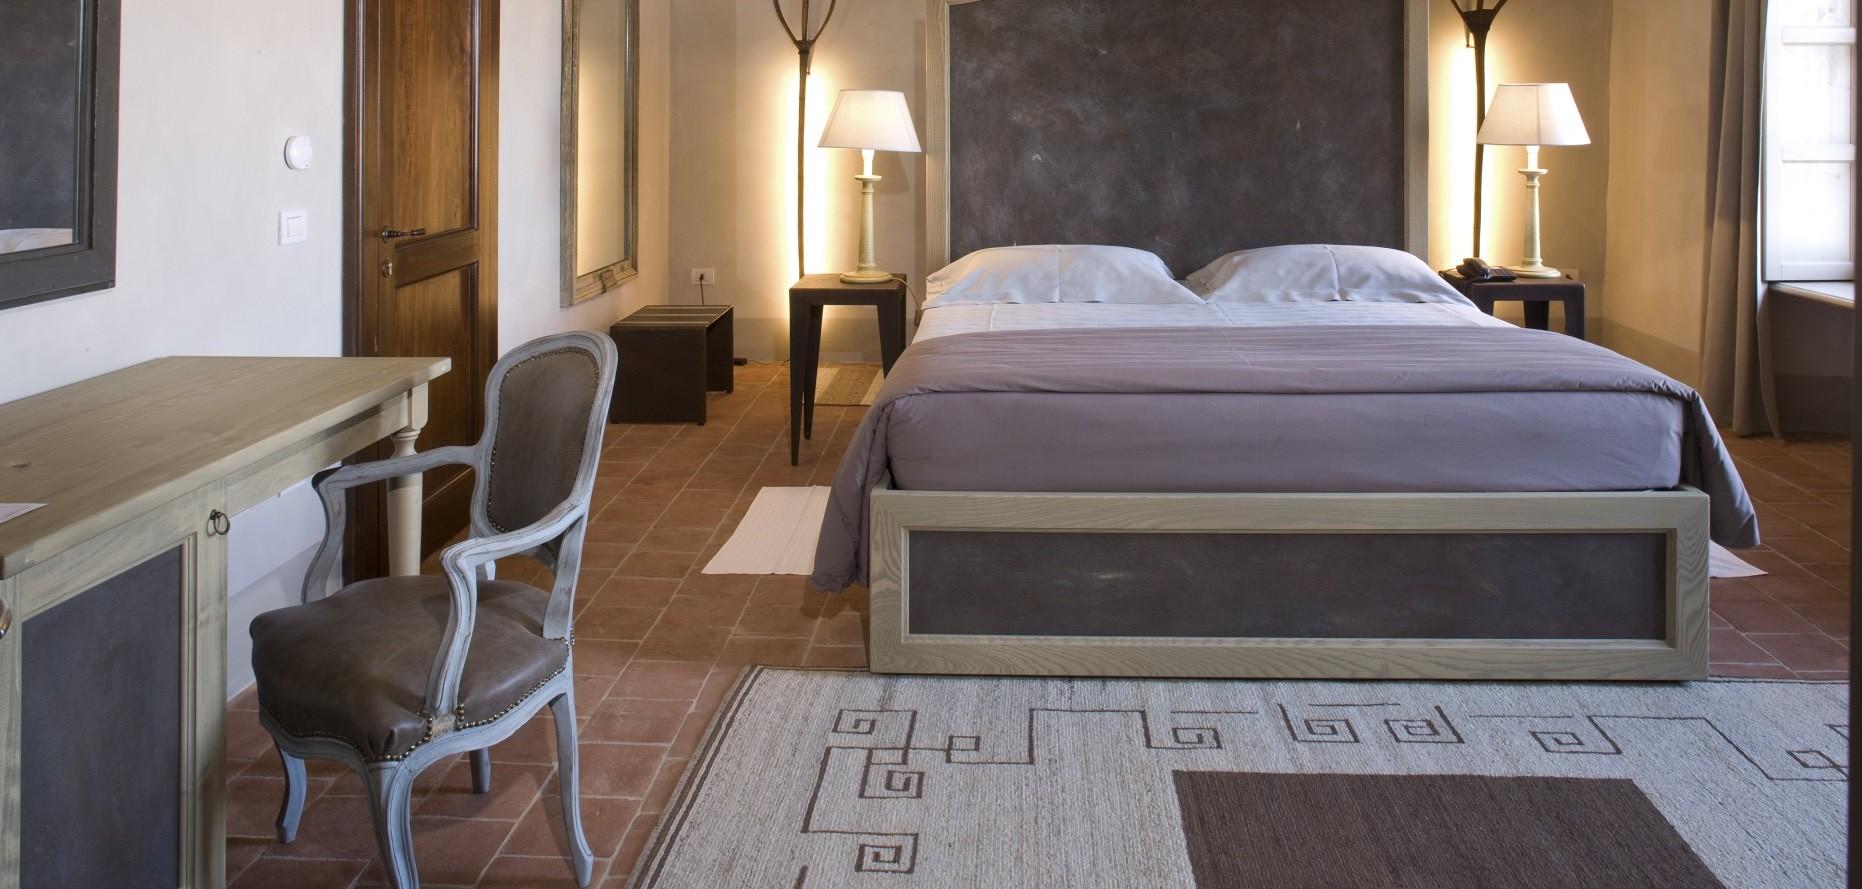 Formaligno interior design wooden legno wood working for Wooden hotel design